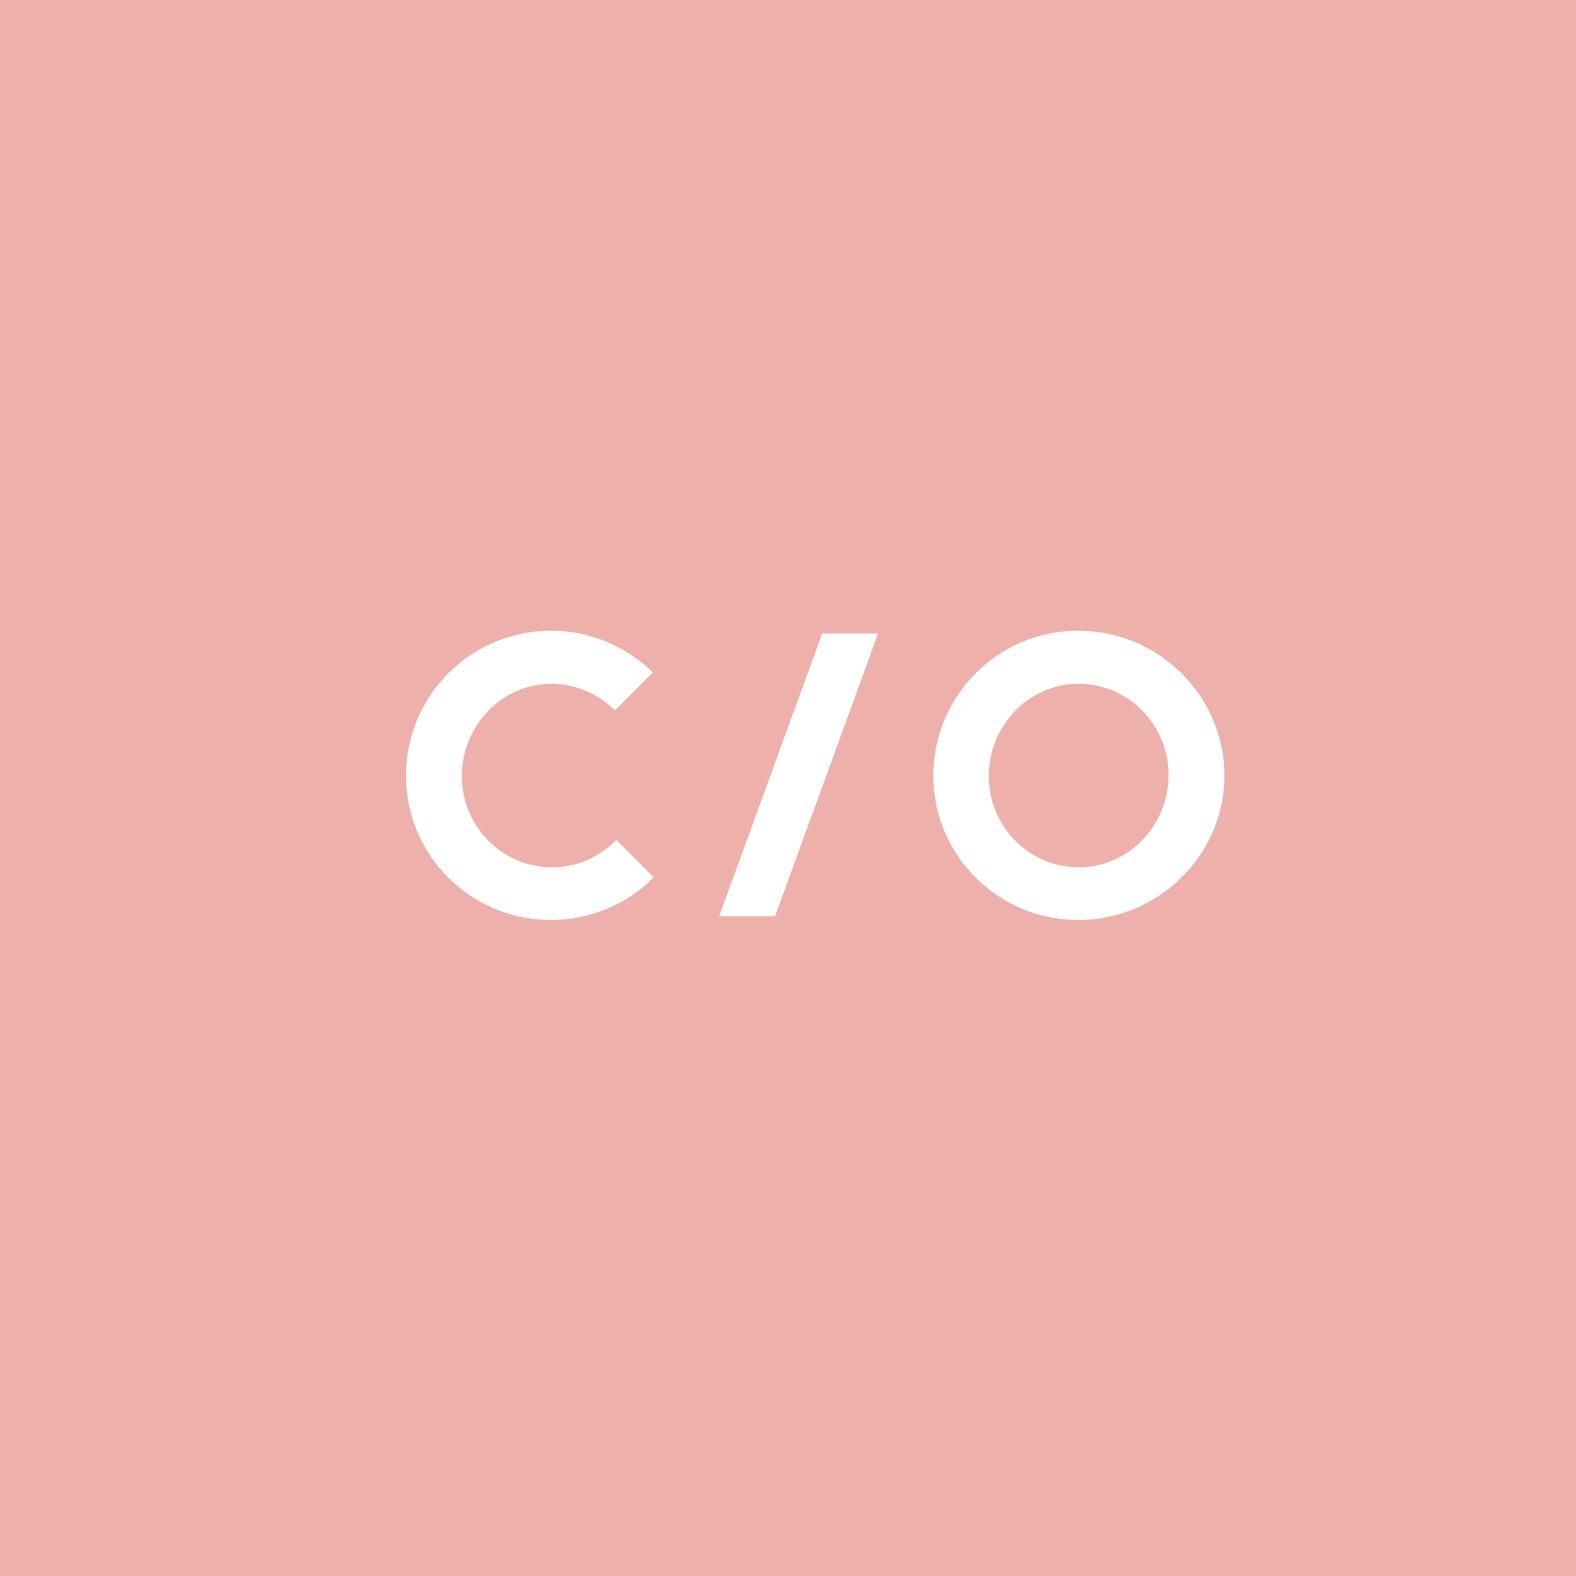 of Logo-02.png